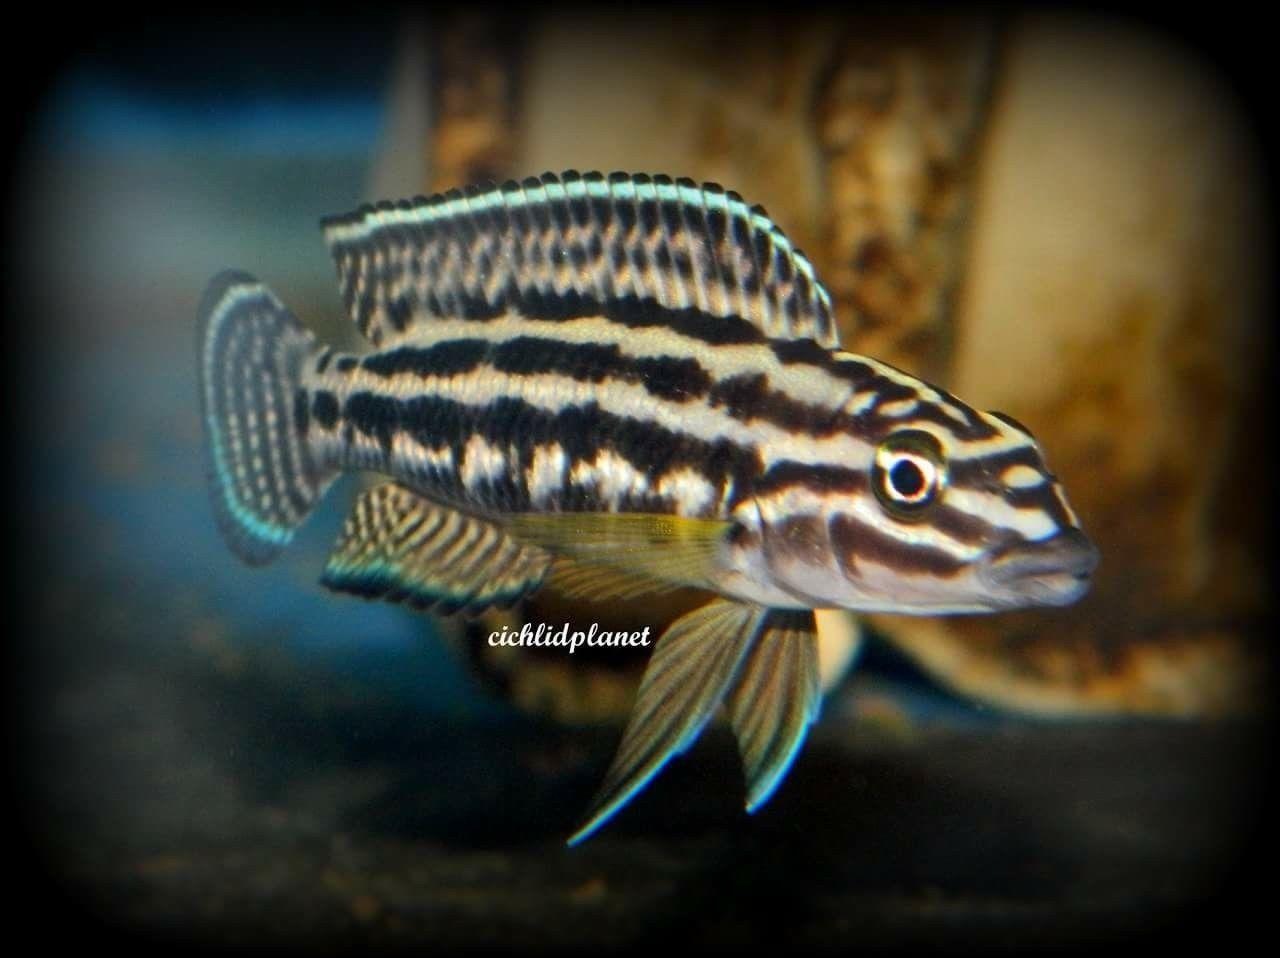 4 Julidochromis Burundi Live Freshwater Aquarium Fish African Cichlids A Group Of Four 1 F2 Julidochromis Tropical Fish Aquarium Aquarium Fish Cichlids